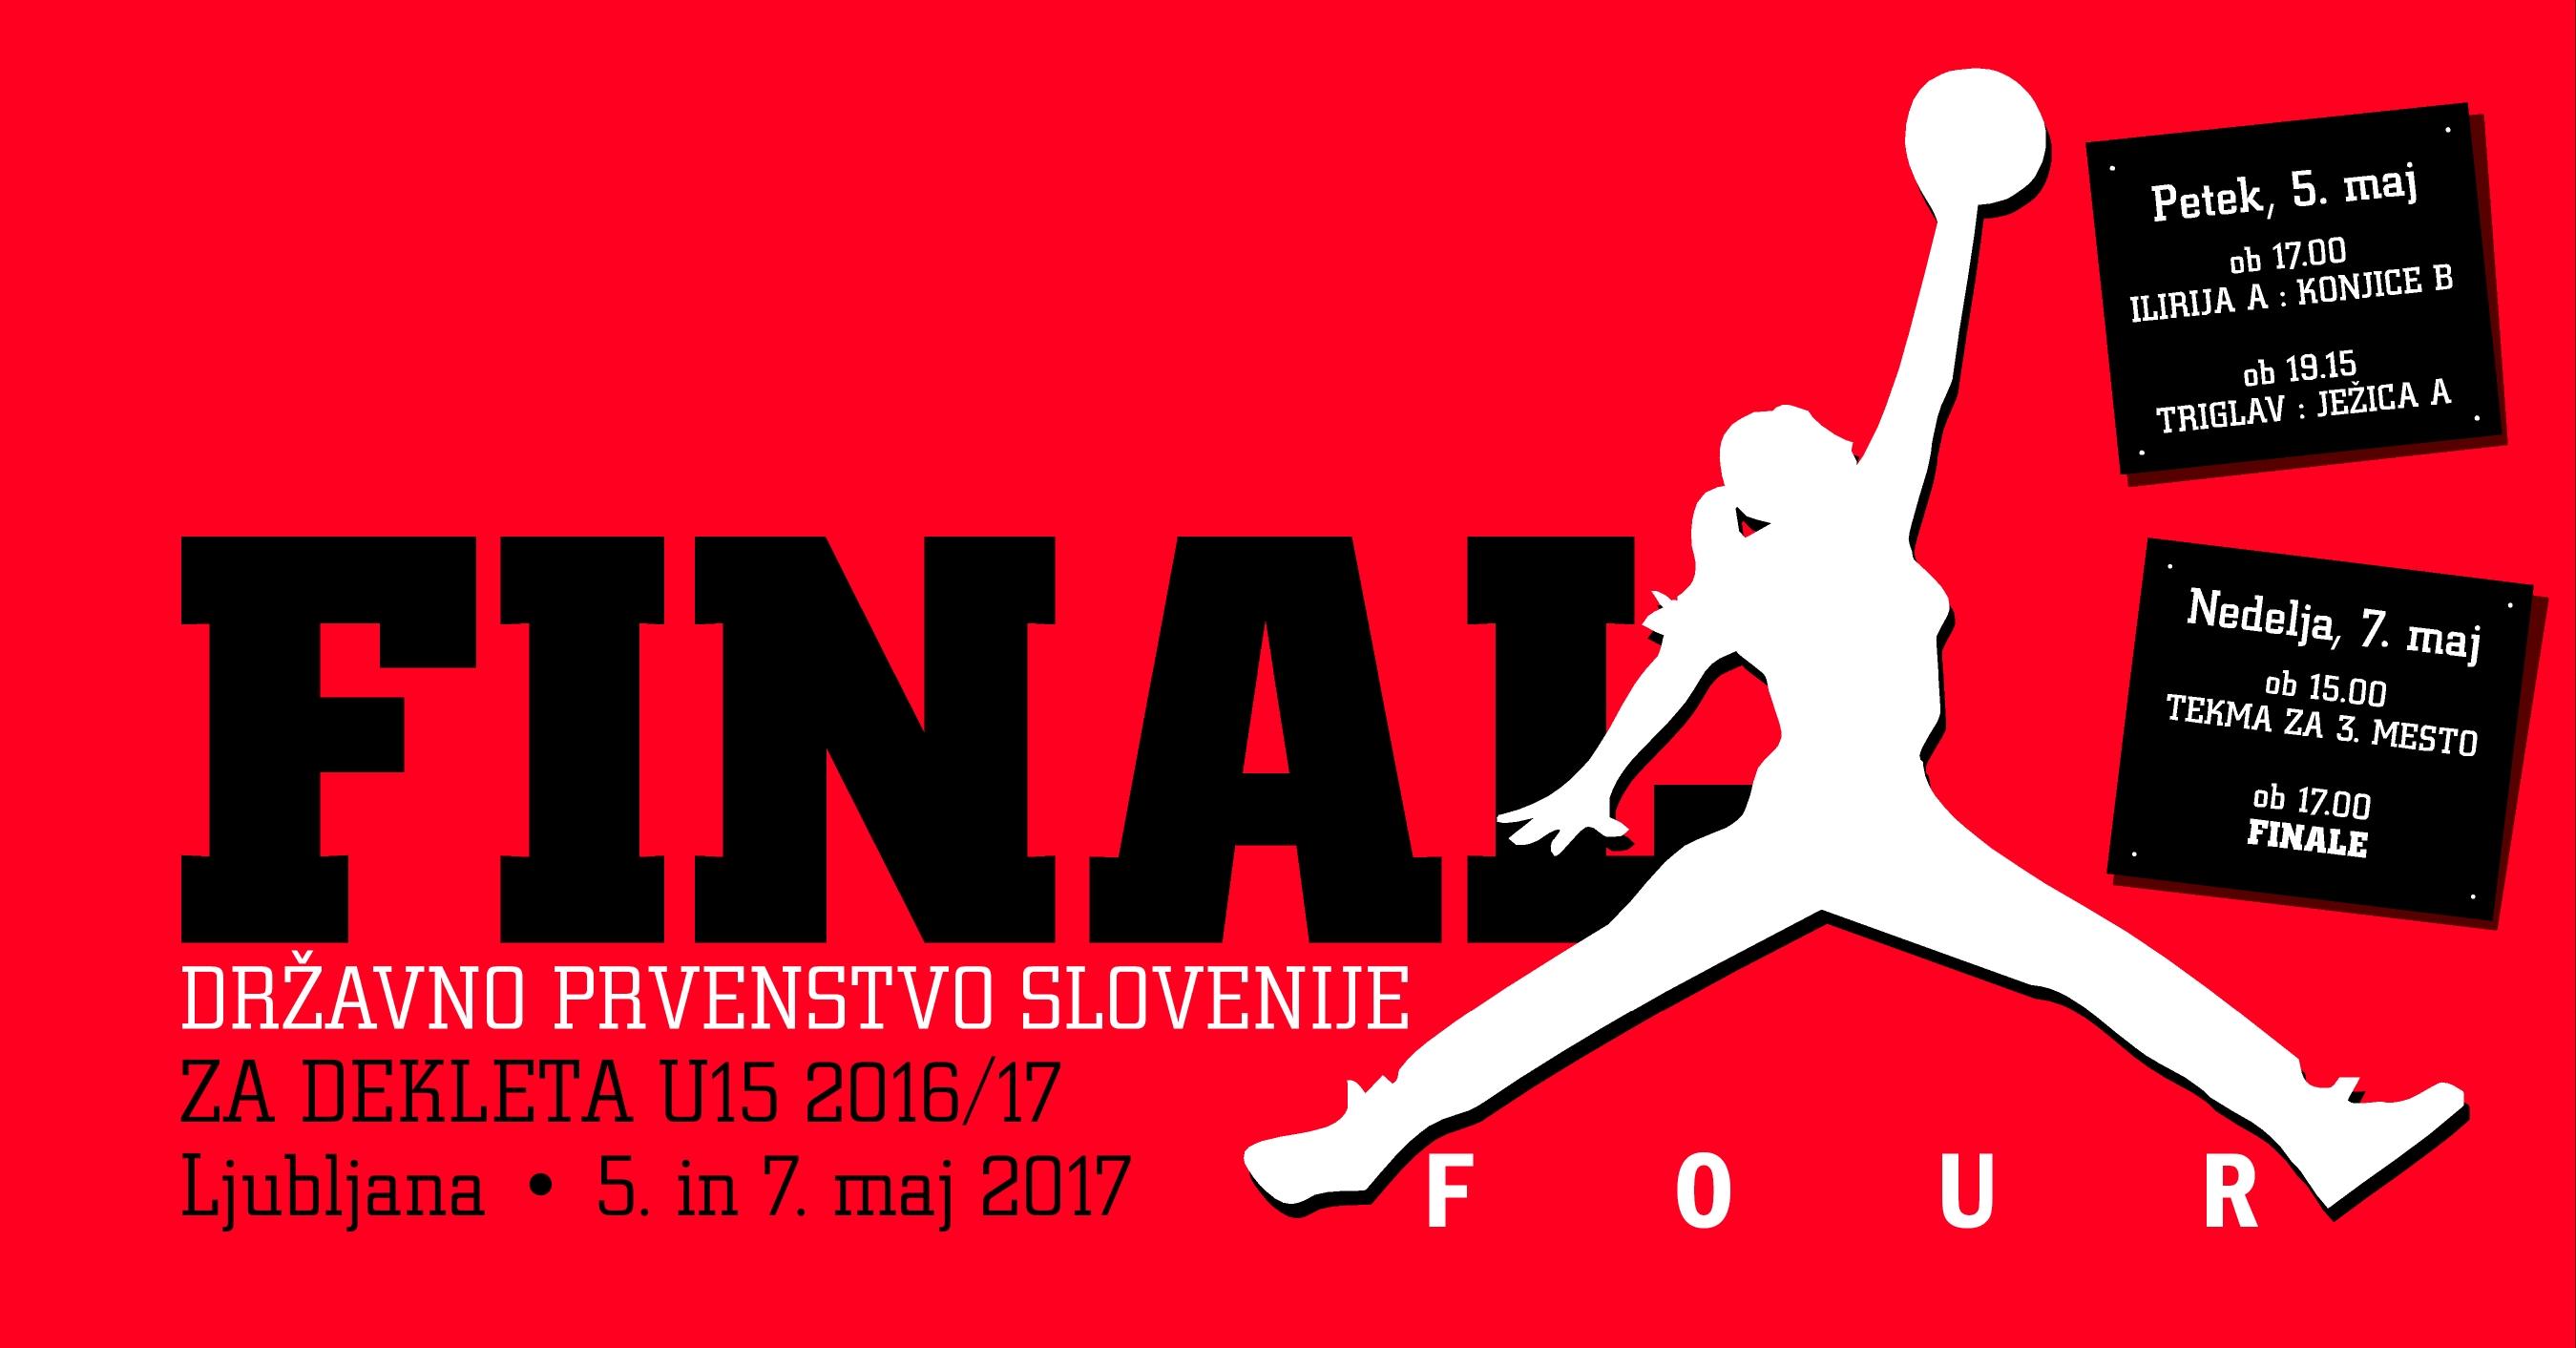 Ilirija gosti zaključni turnir DP za dekleta U15